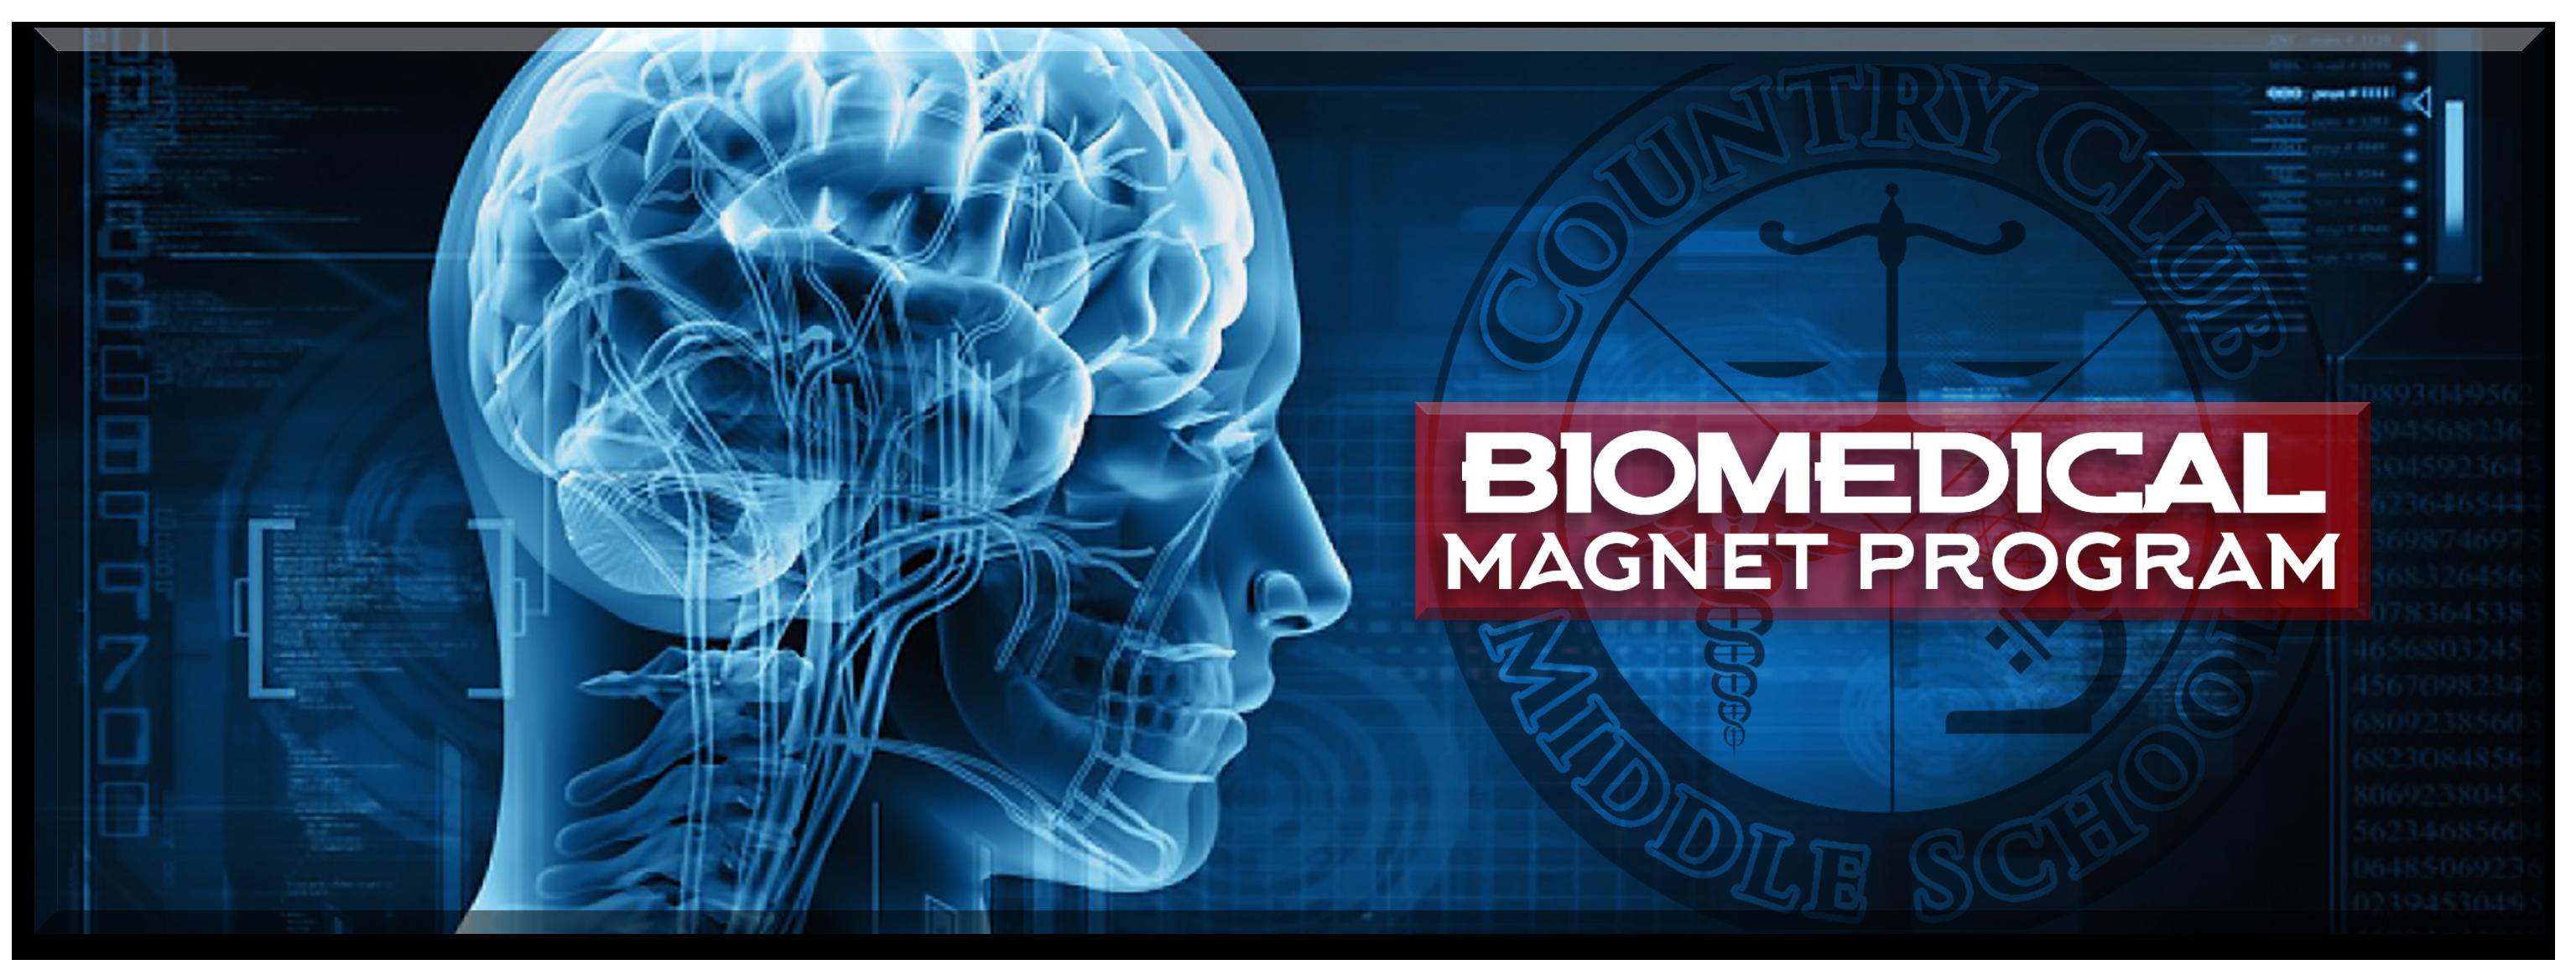 Biomedical Magnet Program Image